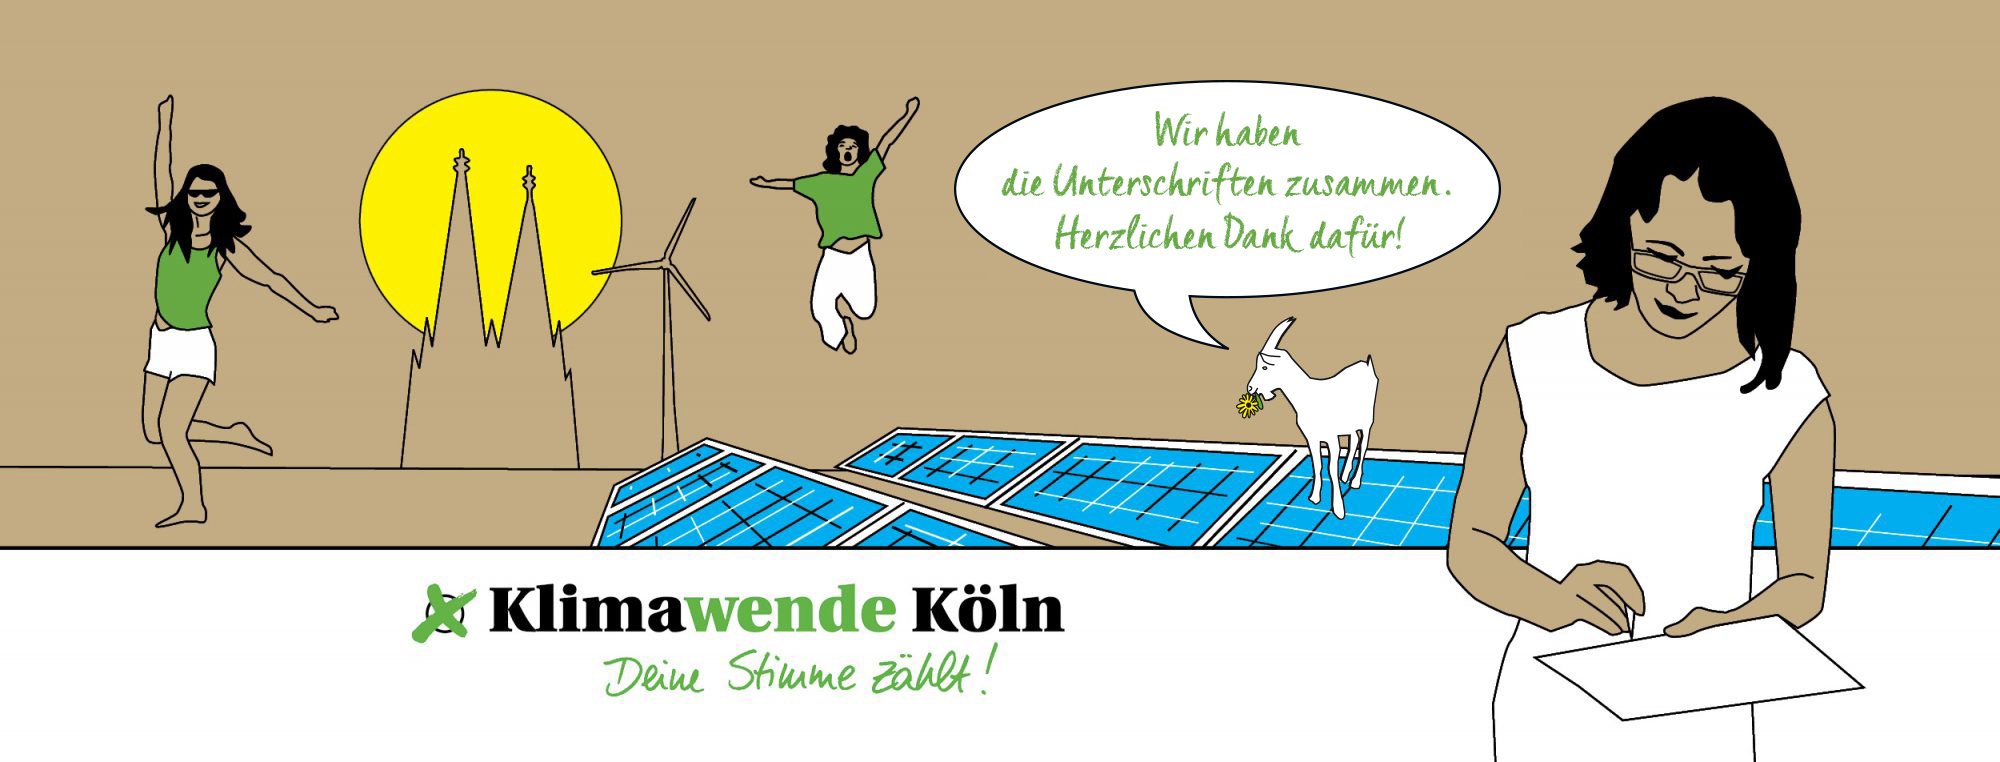 Klimawende Köln